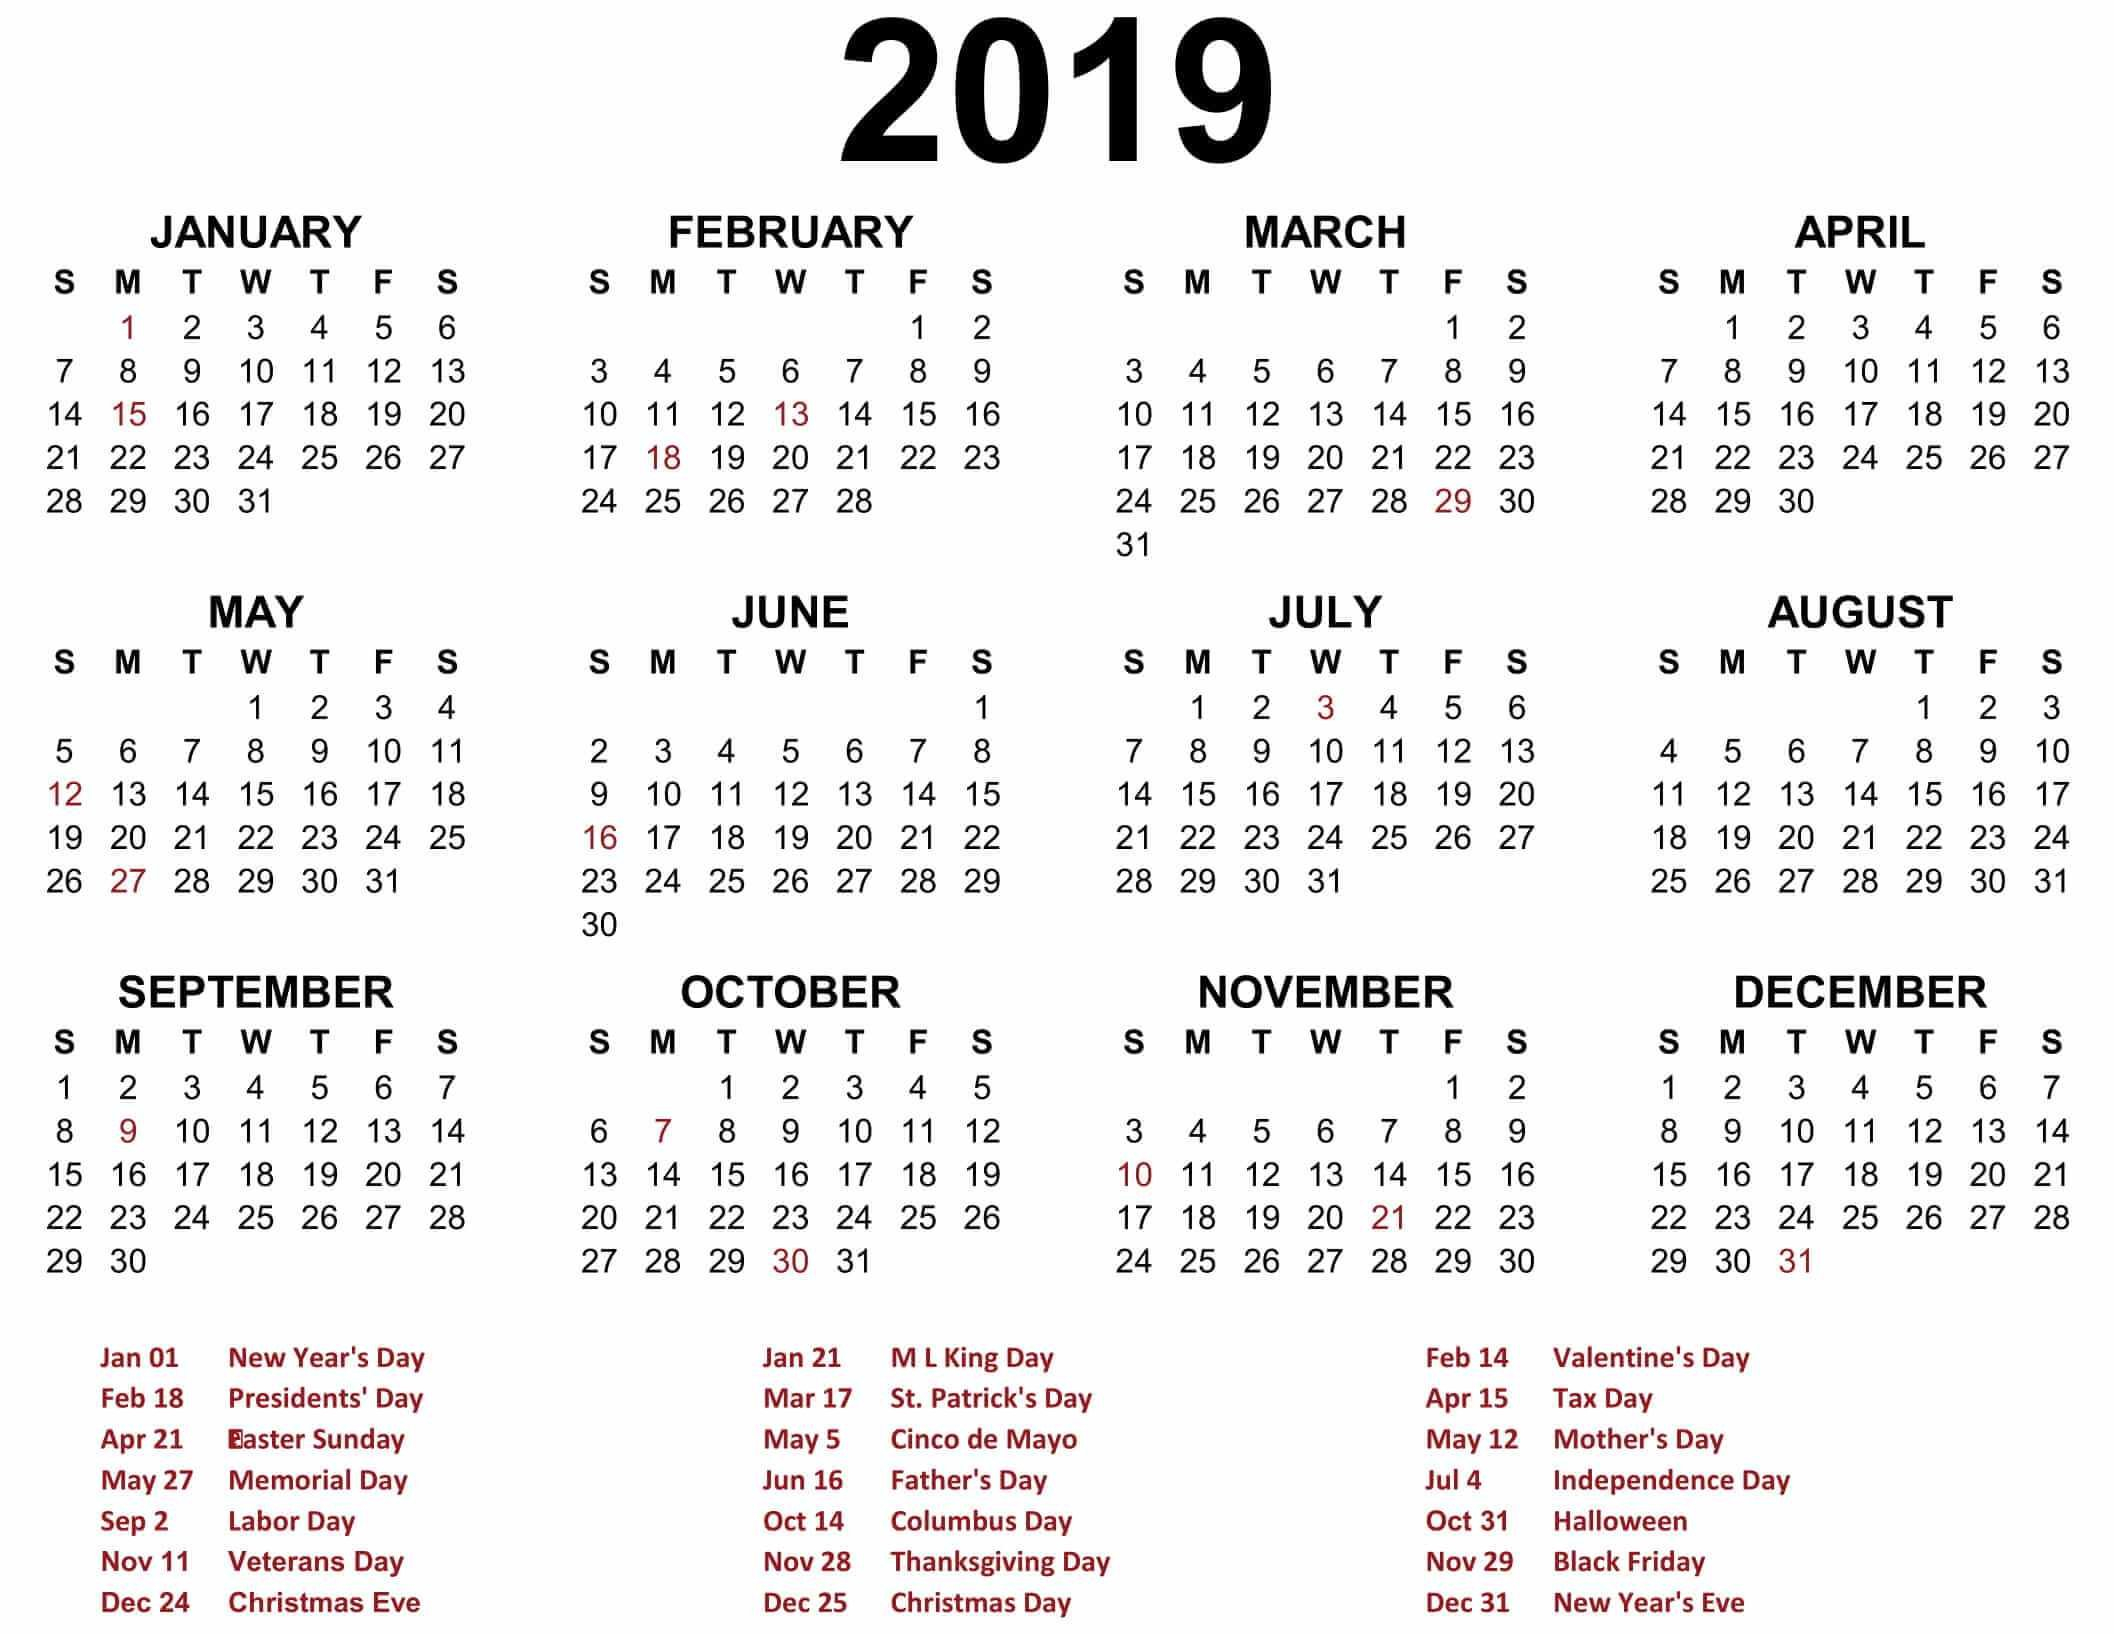 Free Yearly Calendar 2019 - Printable Blank Templates - Calendar Calendar 2019 Entire Year